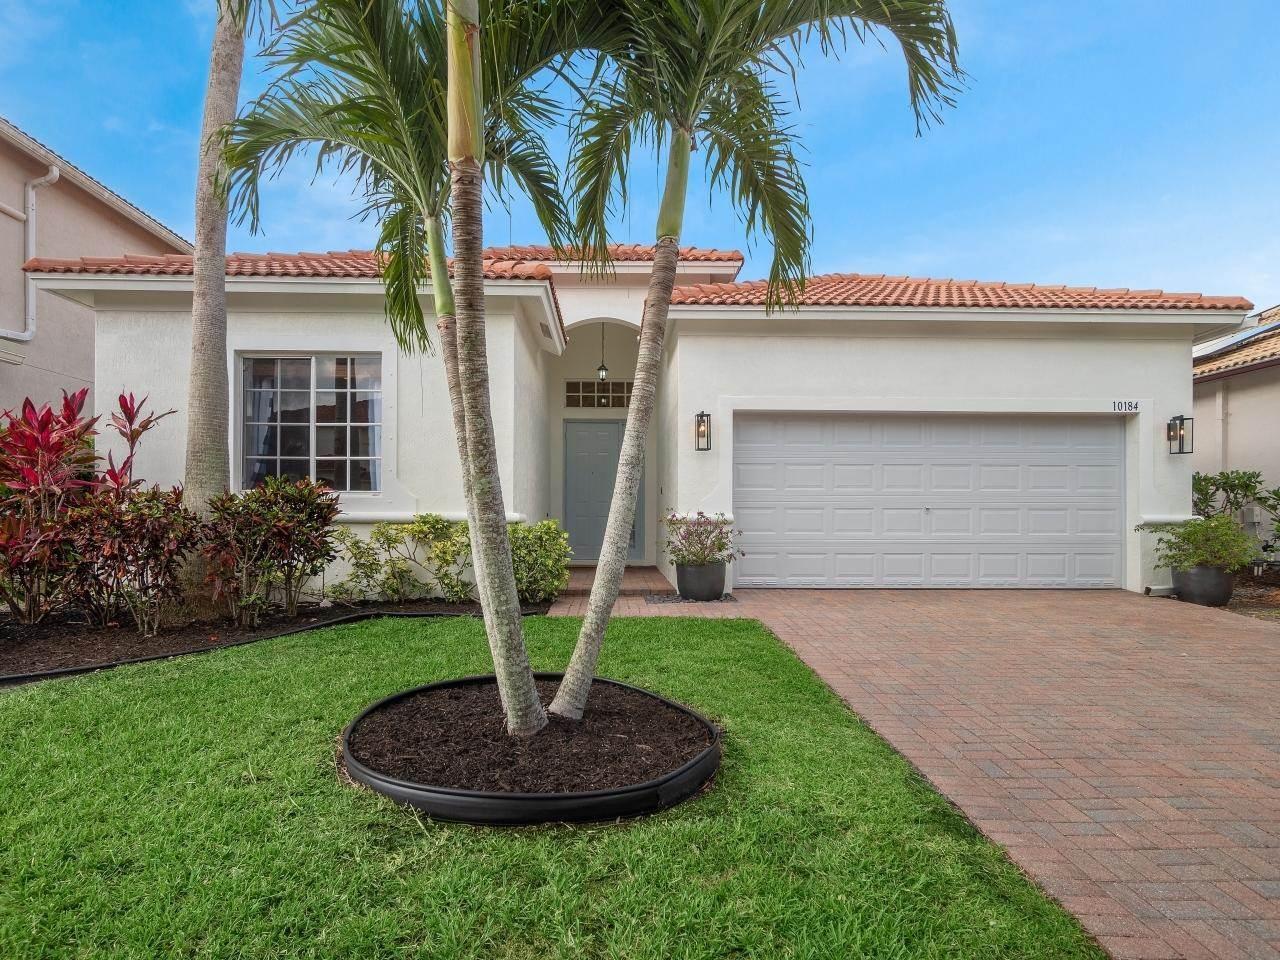 10184 Boca Vista Drive, Boca Raton, FL 33498